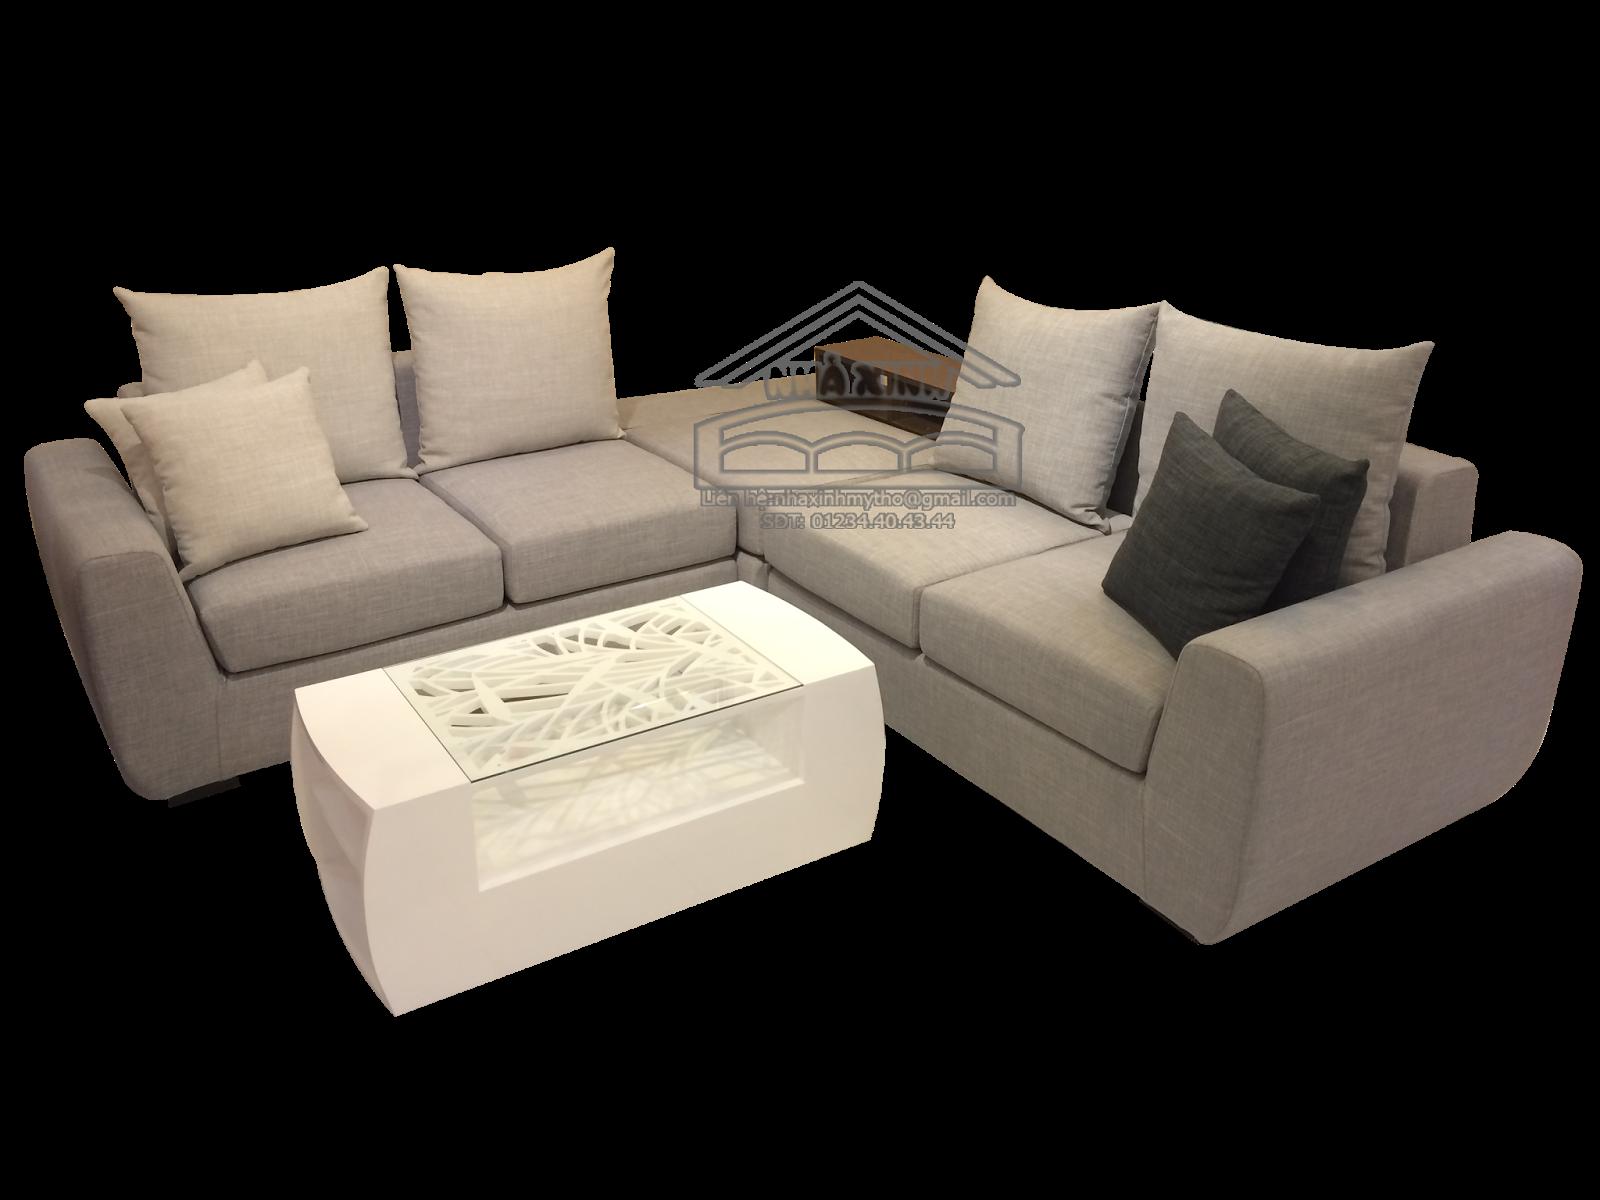 Sofa g c nh xinh m tho sfnx 469 3 for Sofa bed nha xinh